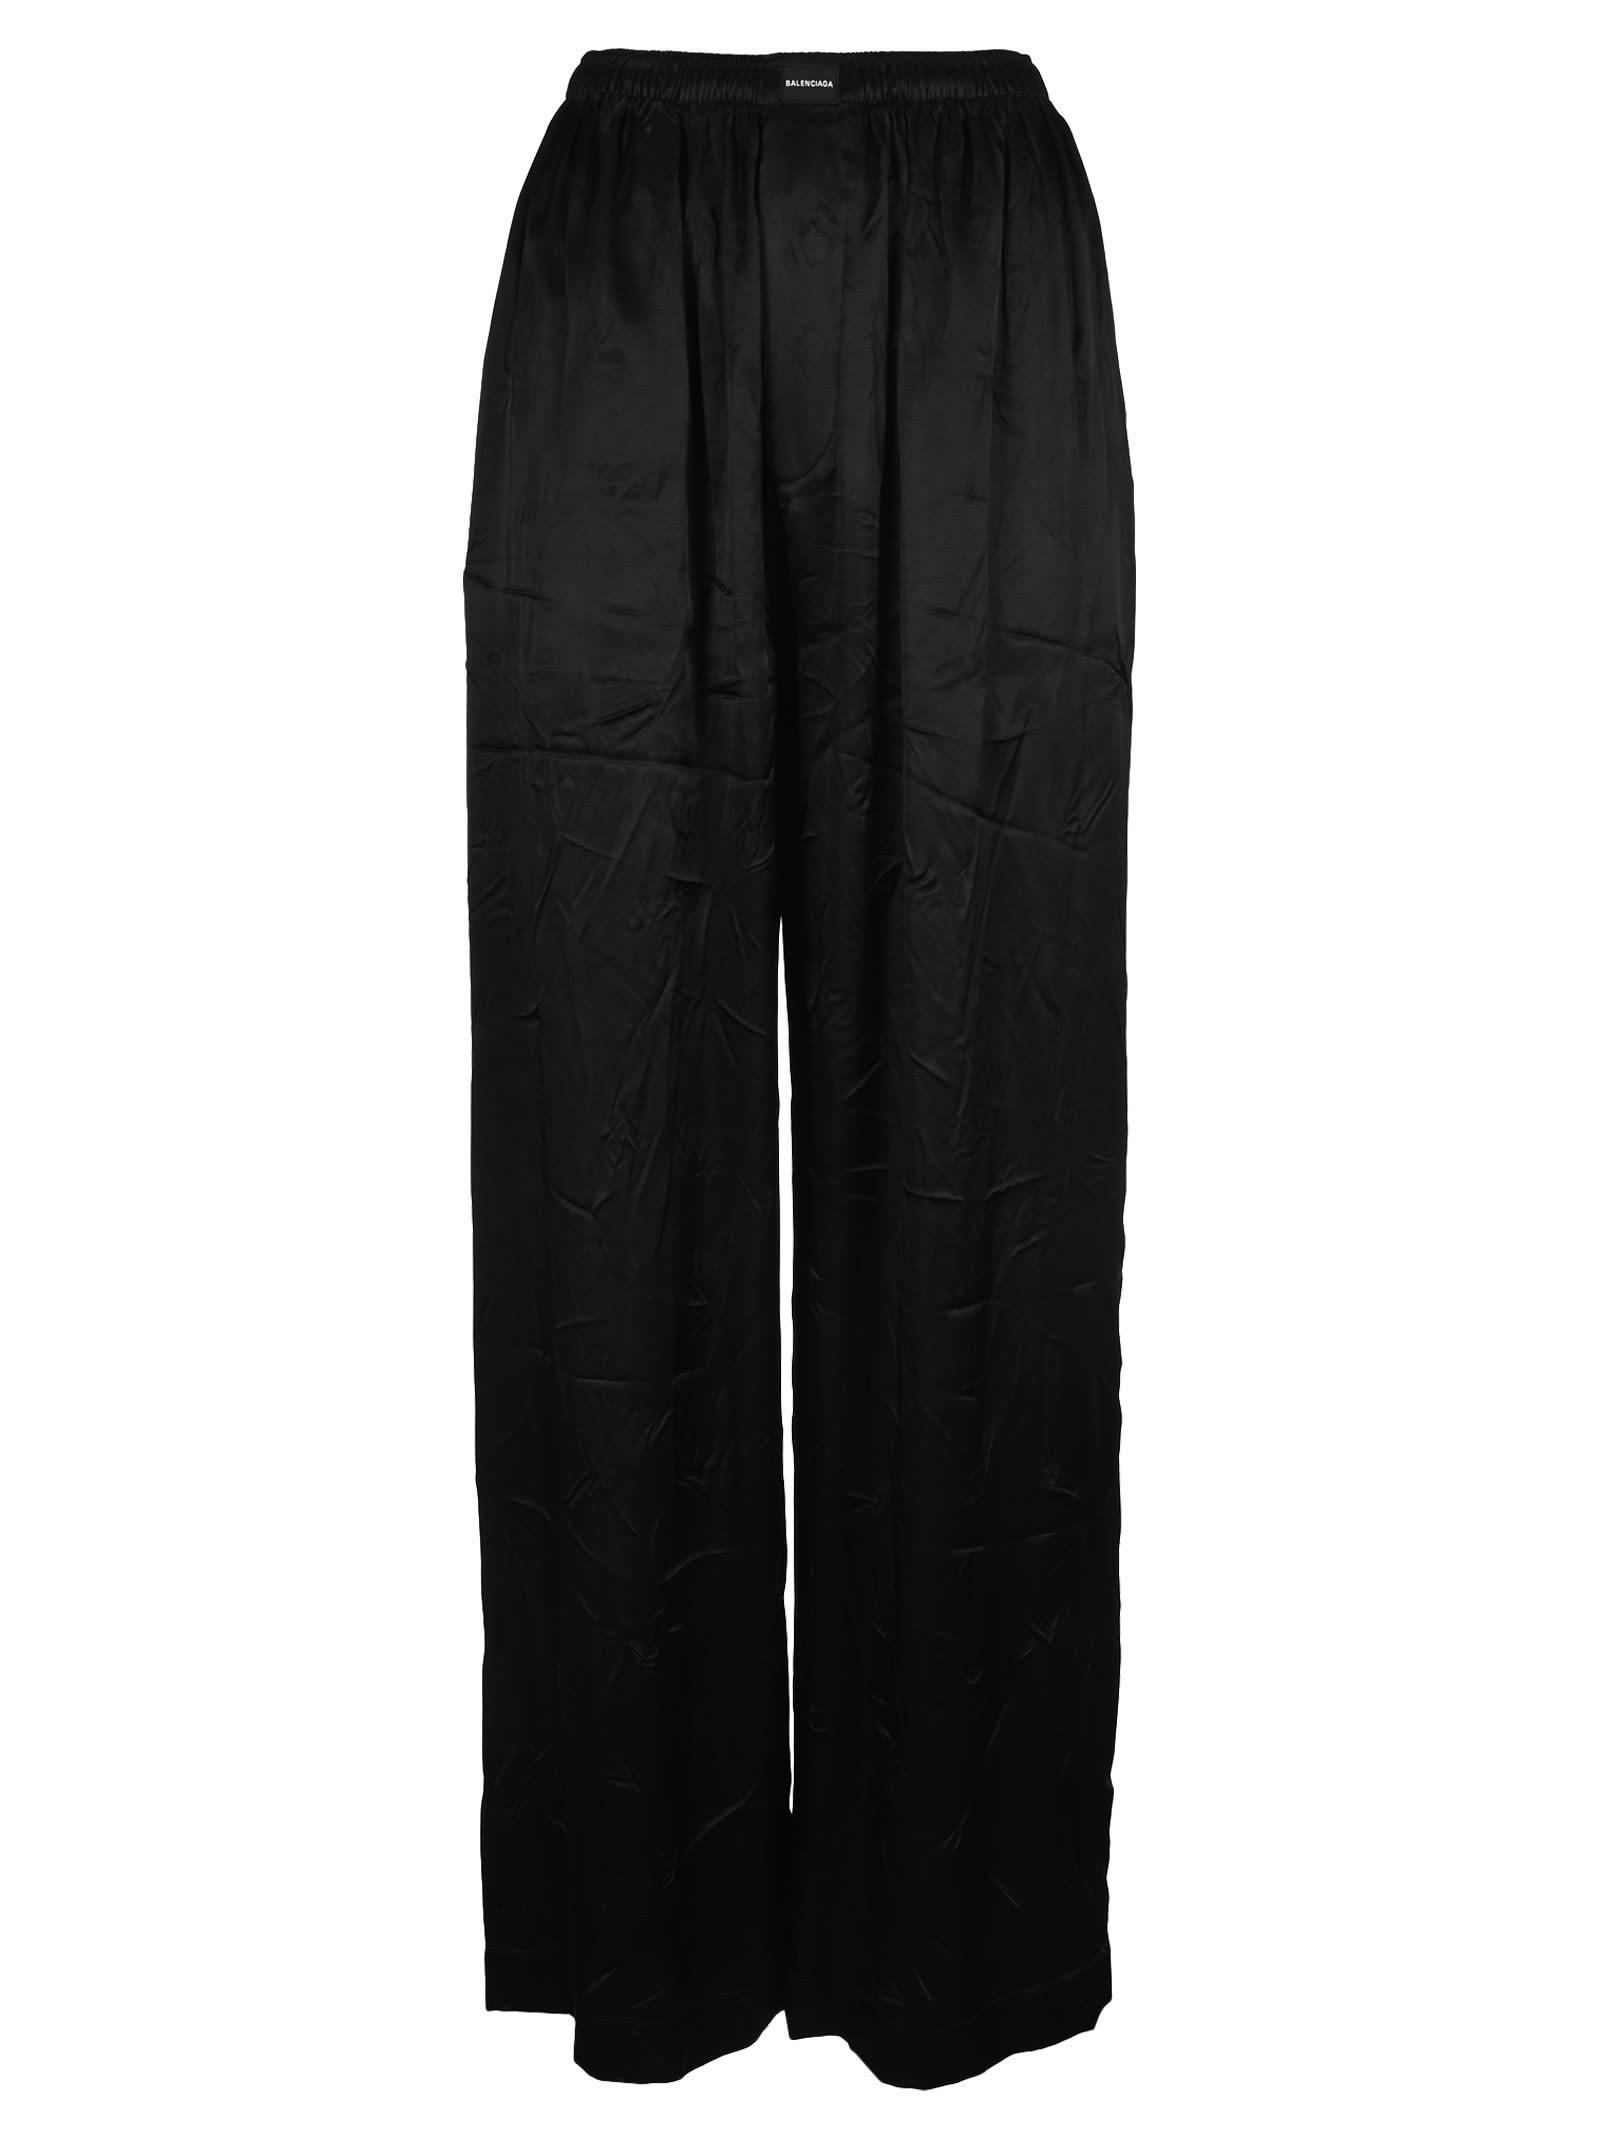 Balenciaga Pijama Style Pants